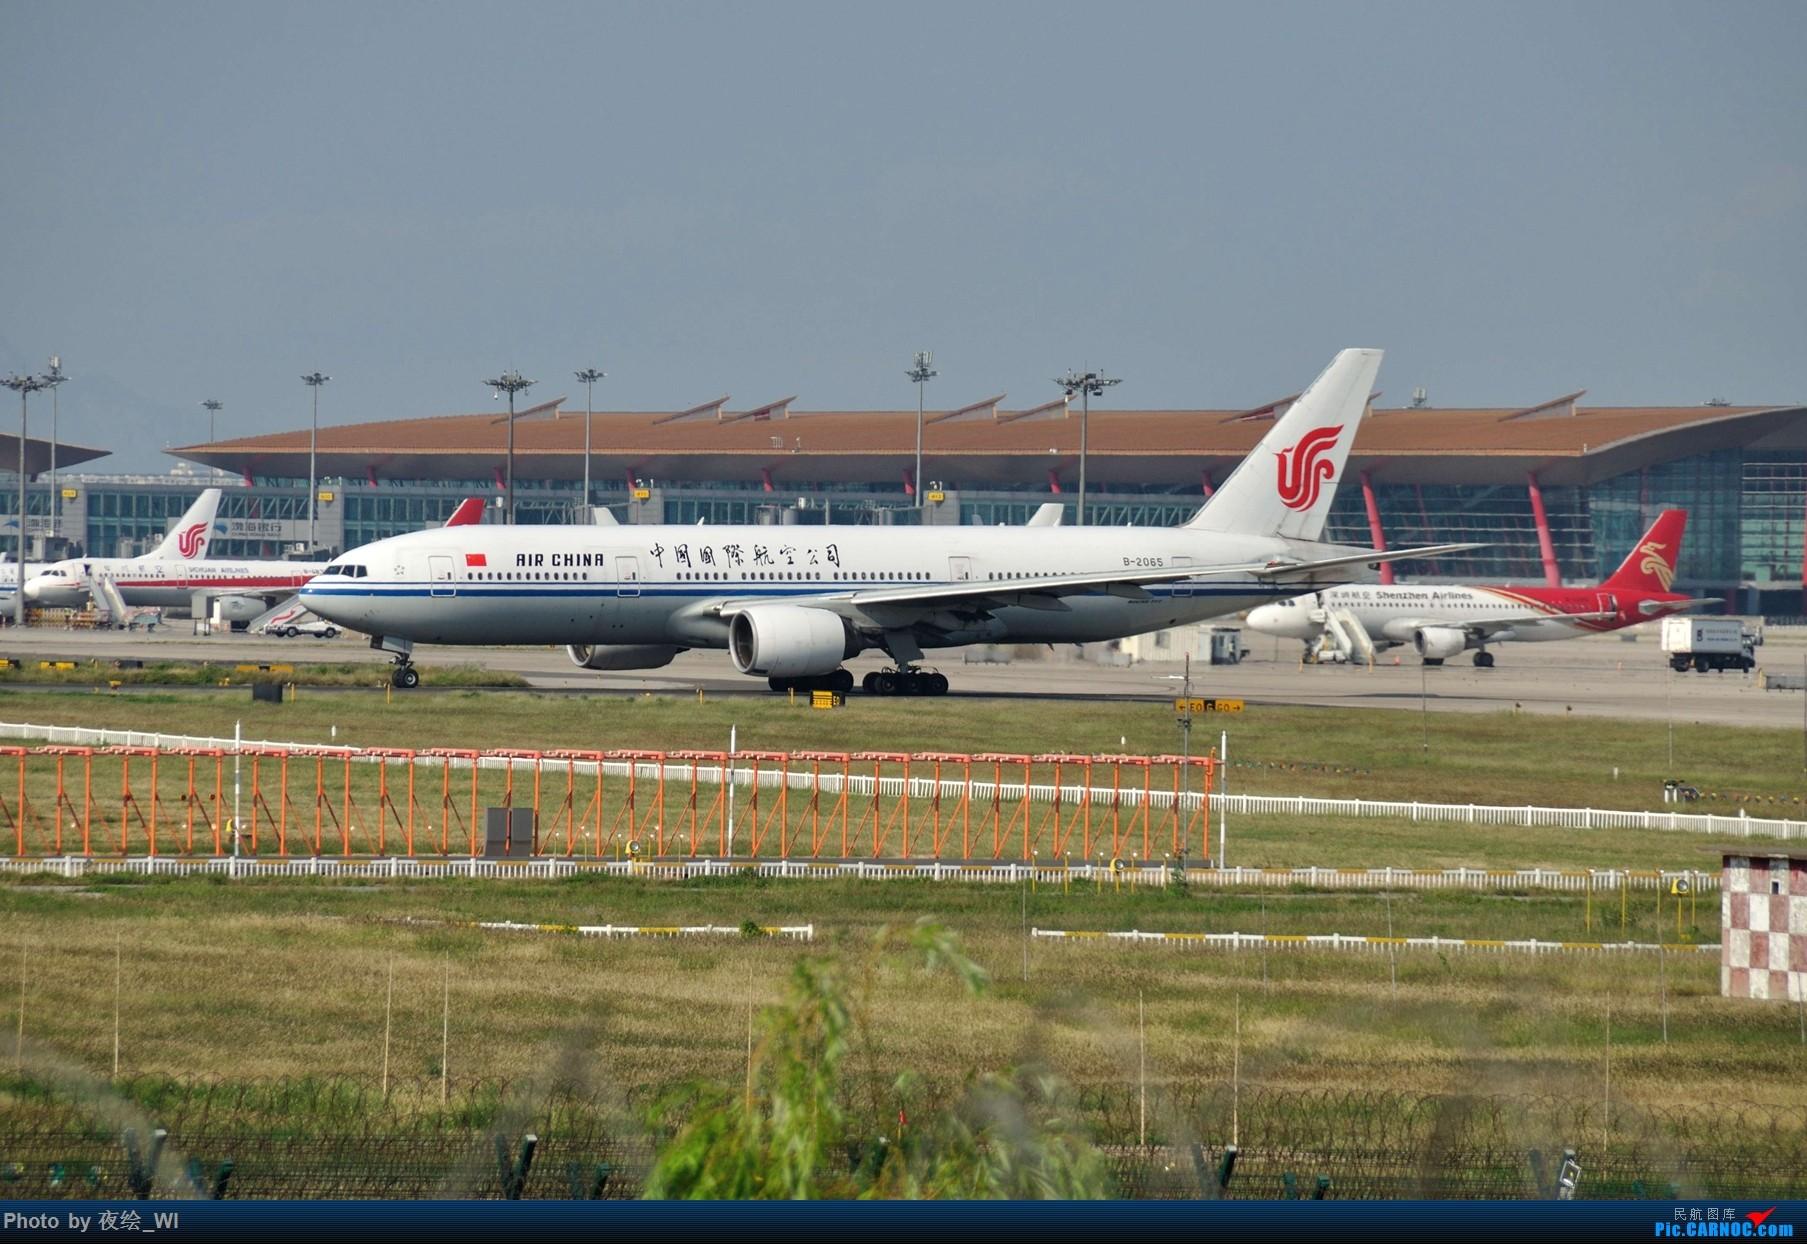 Re:[原创]【PEK】初刷八卦台,拍得飞起! BOEING 777-200 B-2065 中国北京首都国际机场